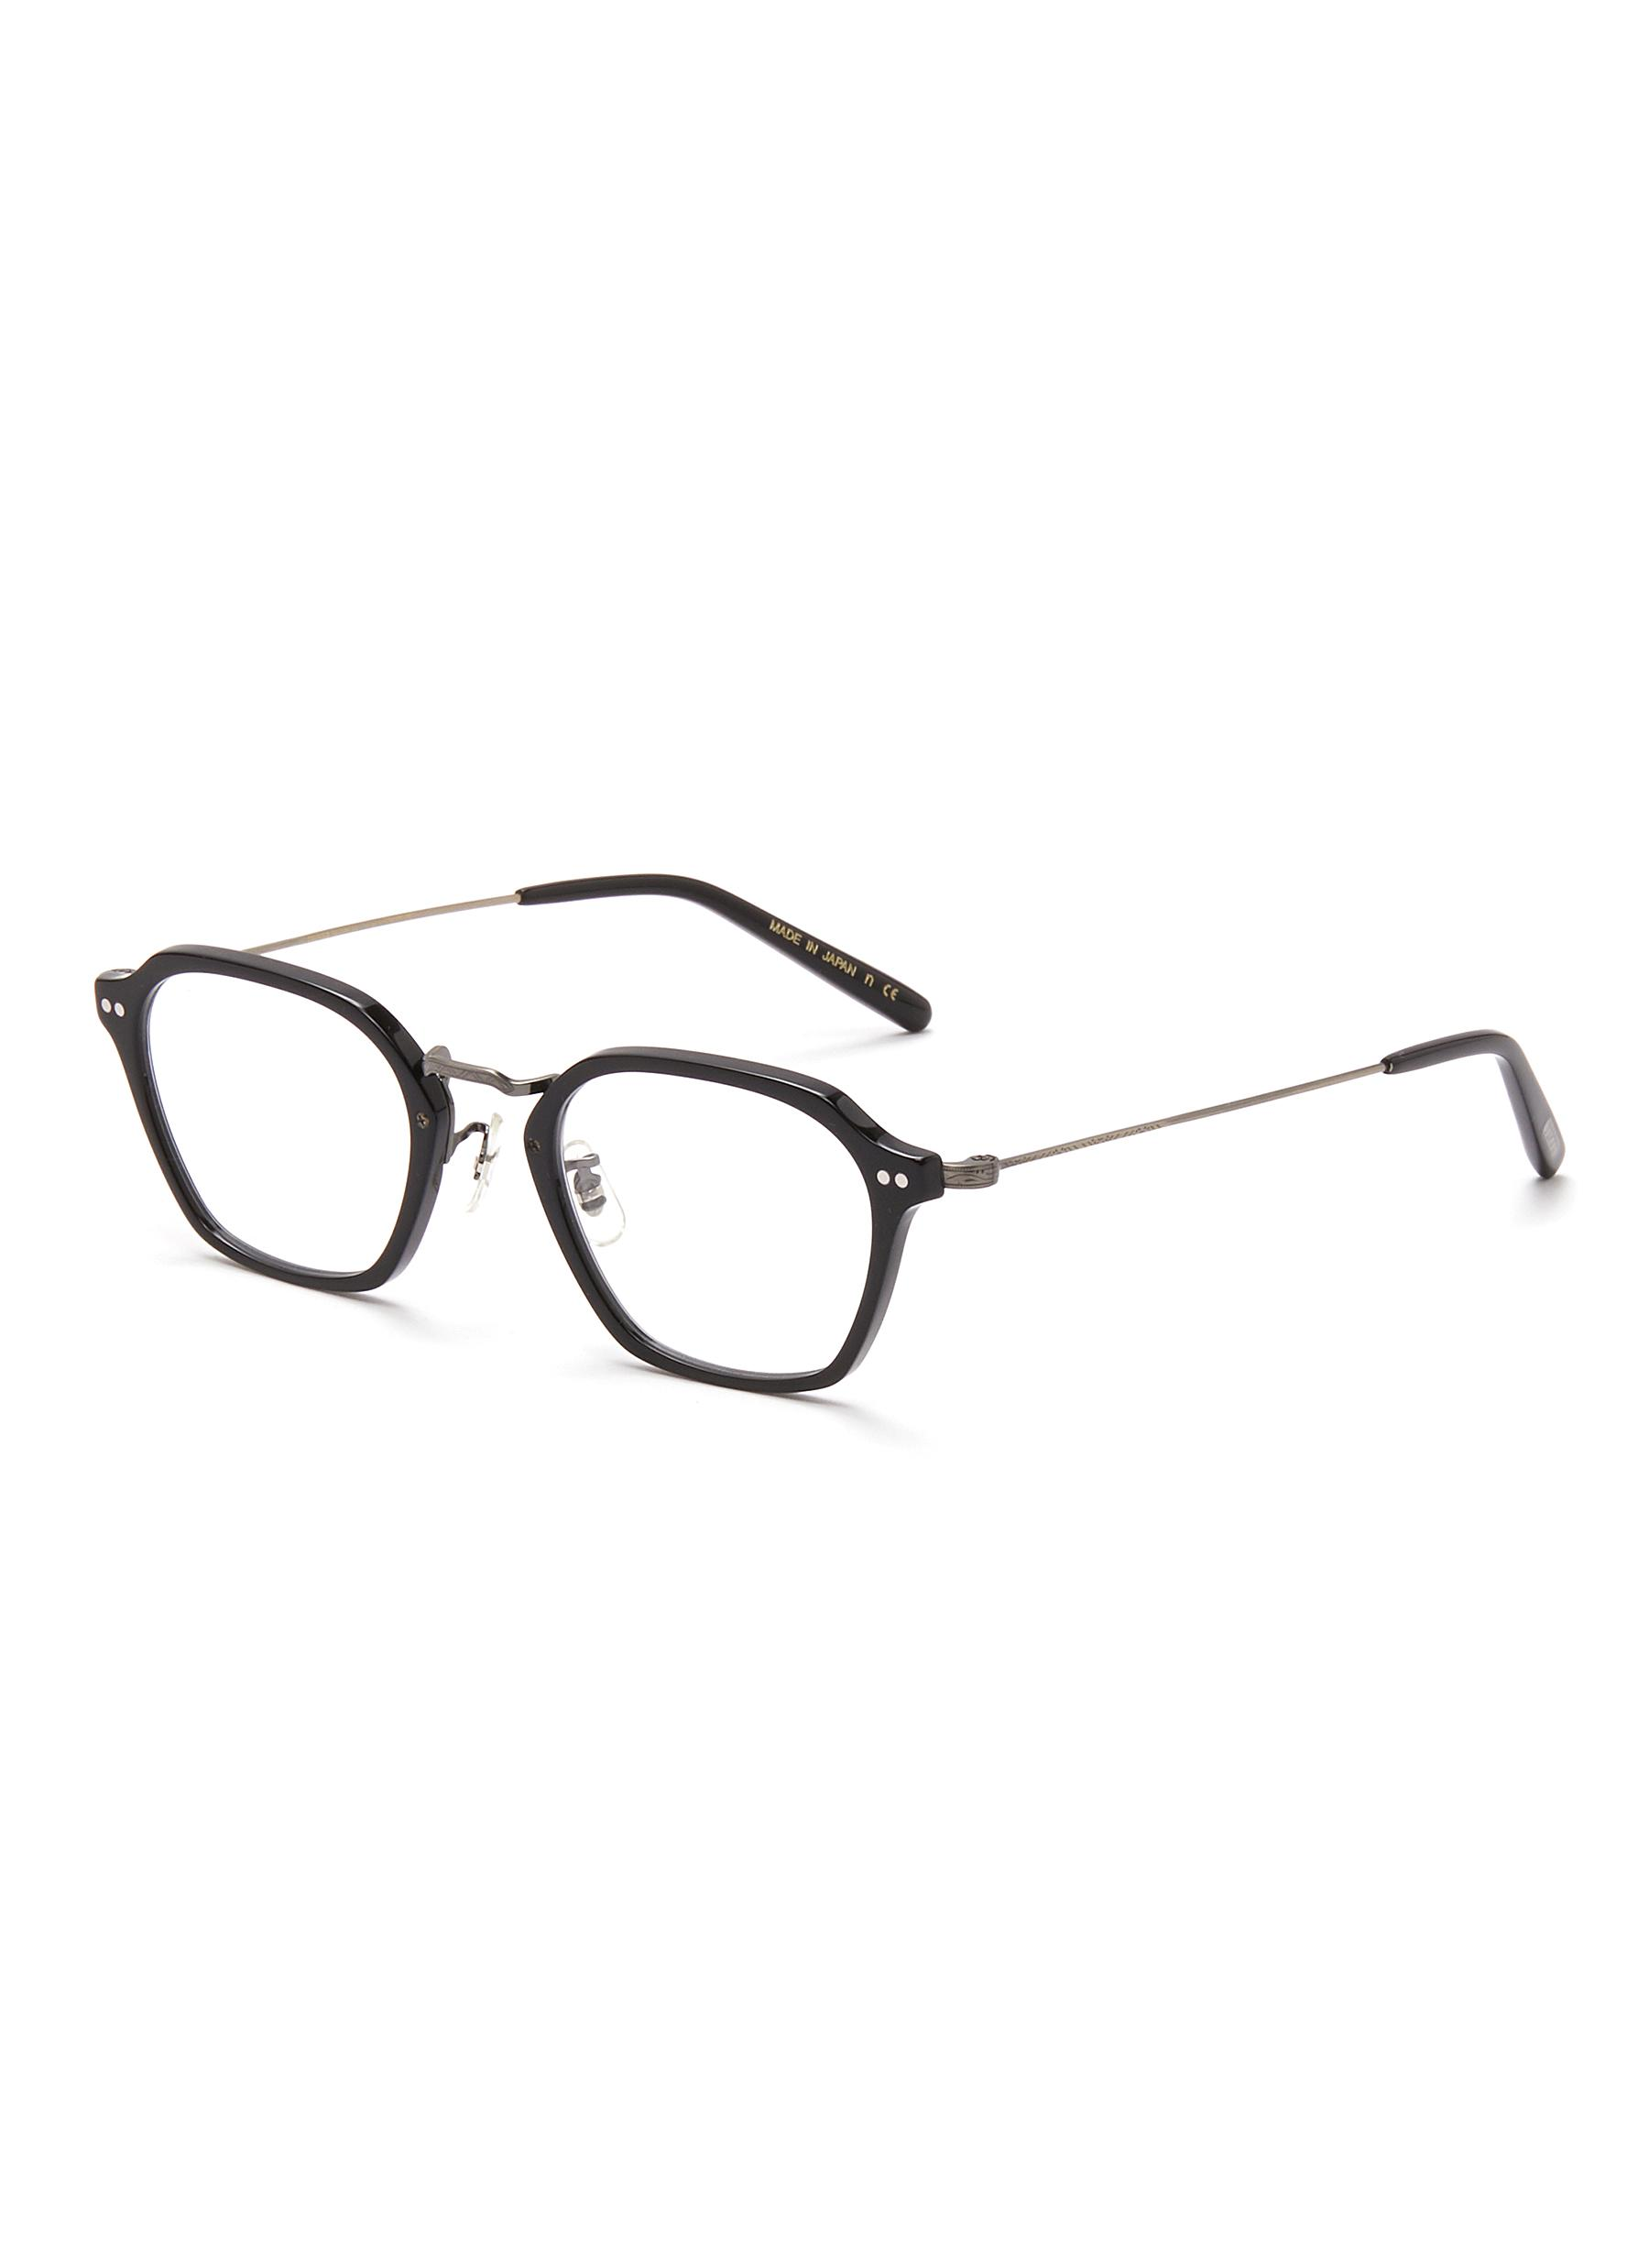 Hilden' Angular Acetate Frame Optical Glasses - OLIVER PEOPLES ACCESSORIES - Modalova